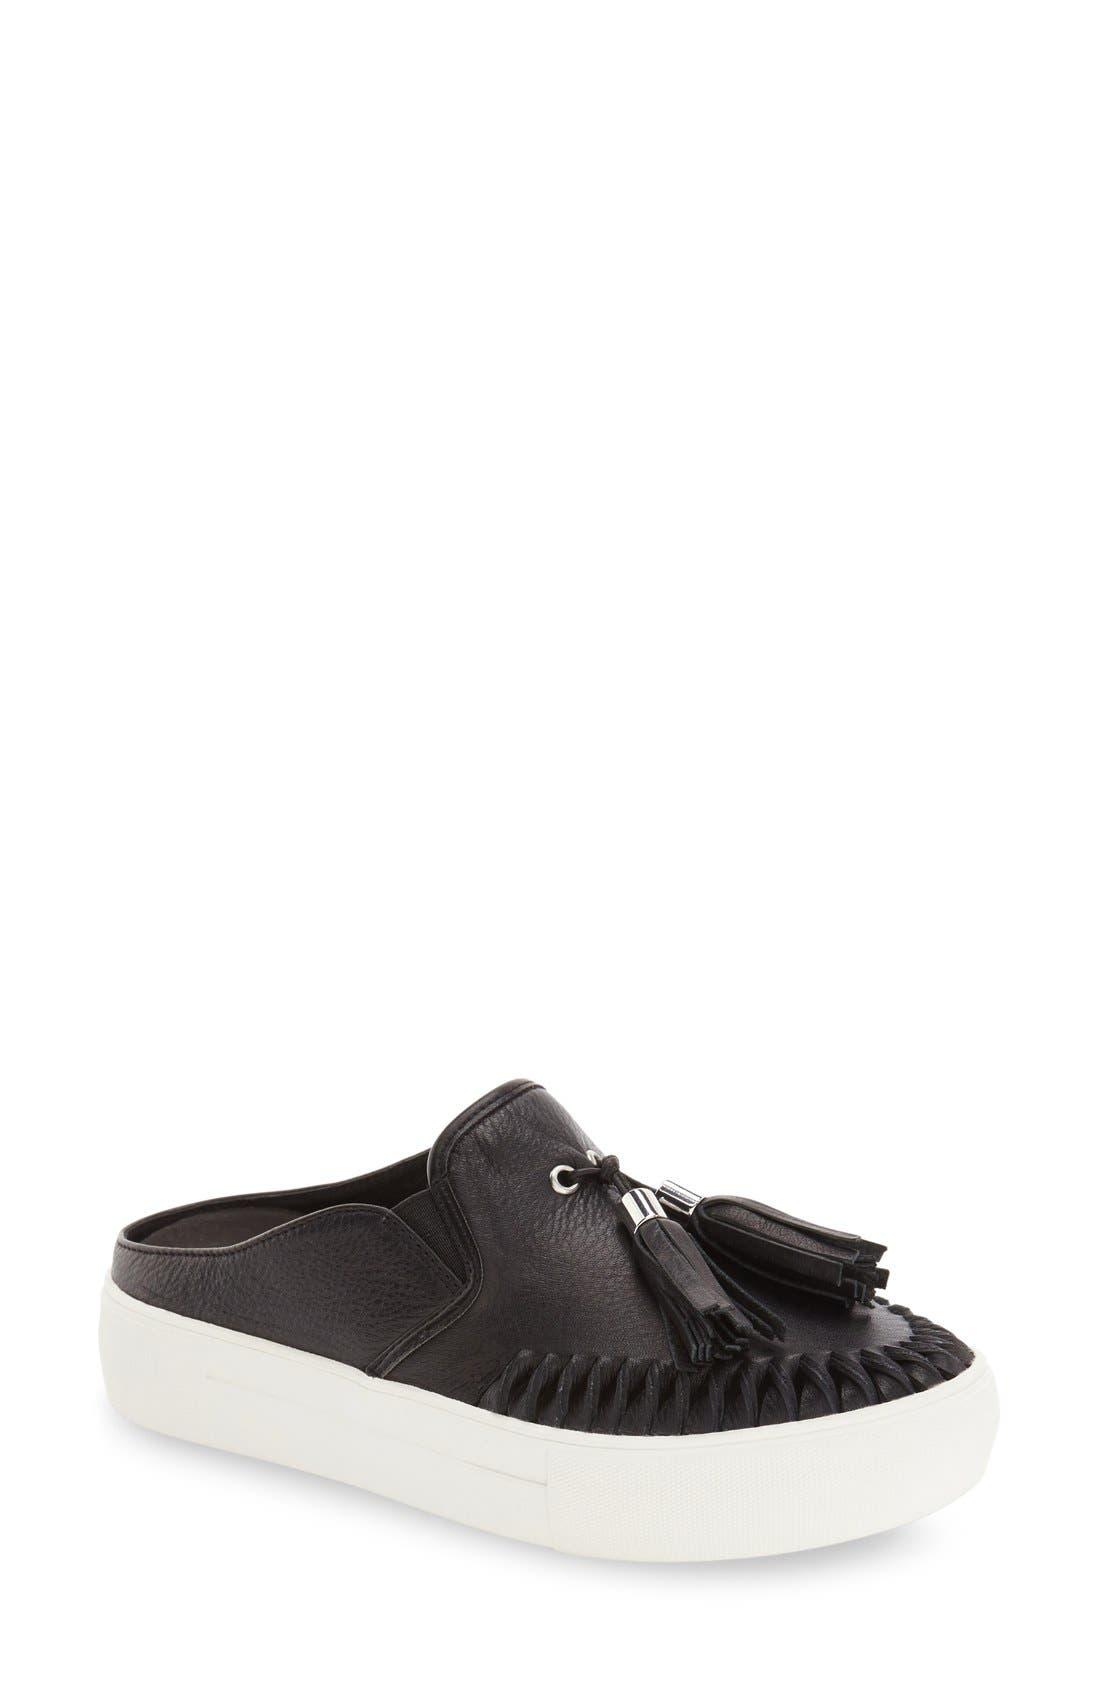 JSLIDES Tassel Slip-On Sneaker, Main, color, 015